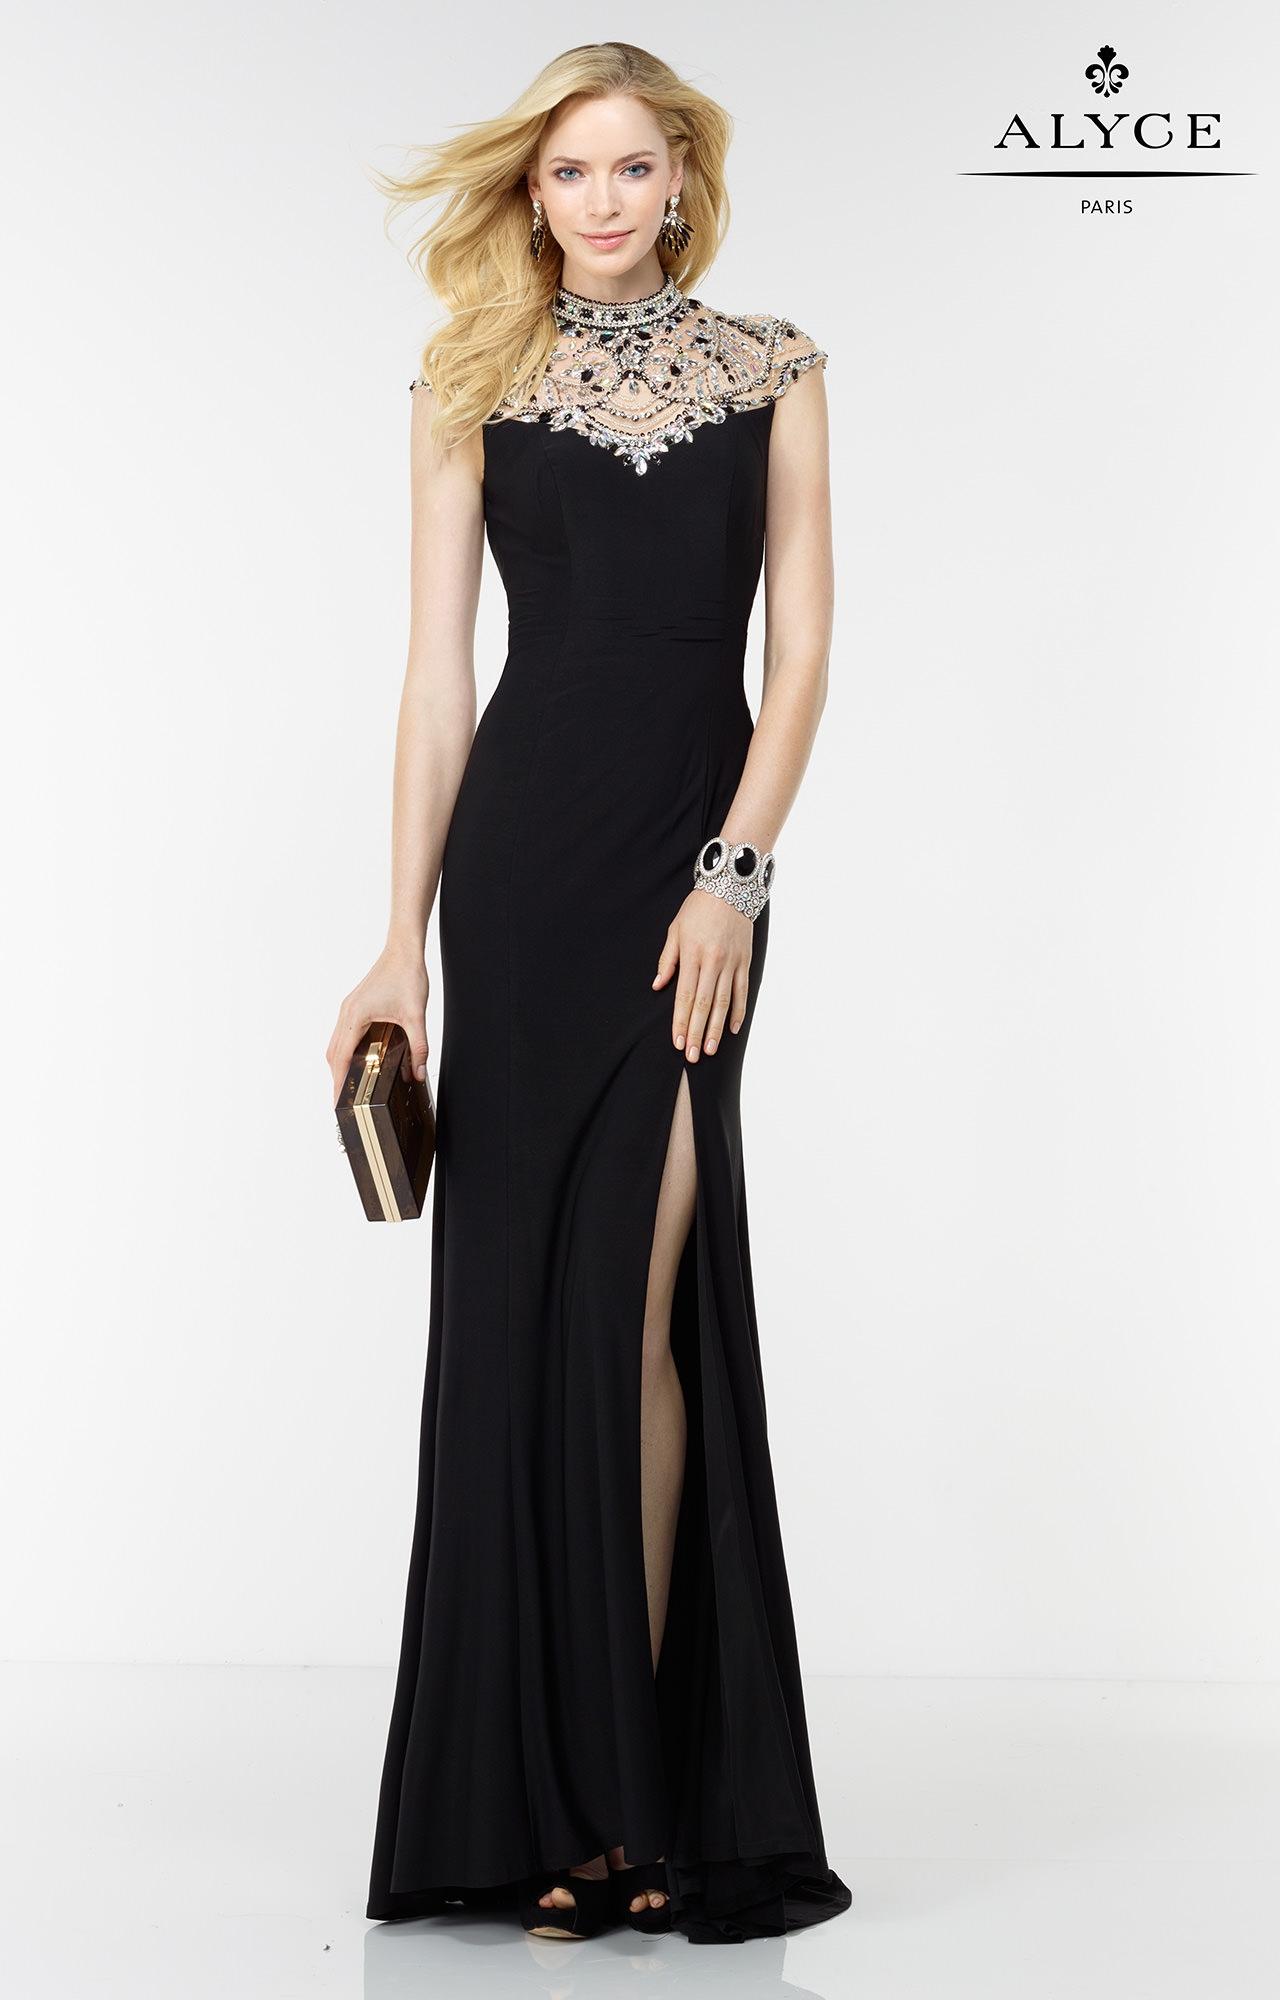 Alyce Paris 6538 She S Fancy Dress Prom Dress